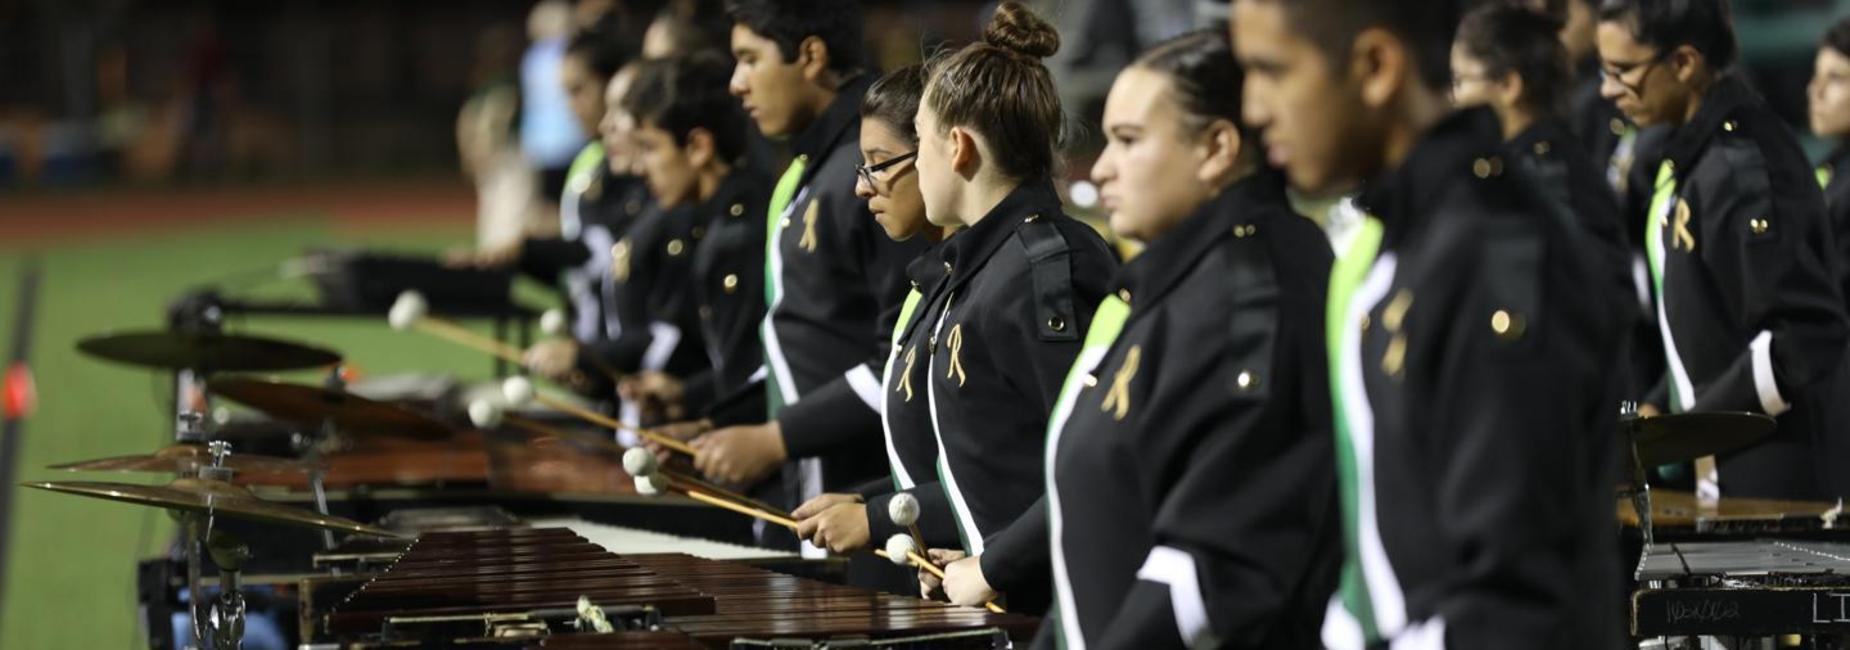 Nikki Rowe Drumline